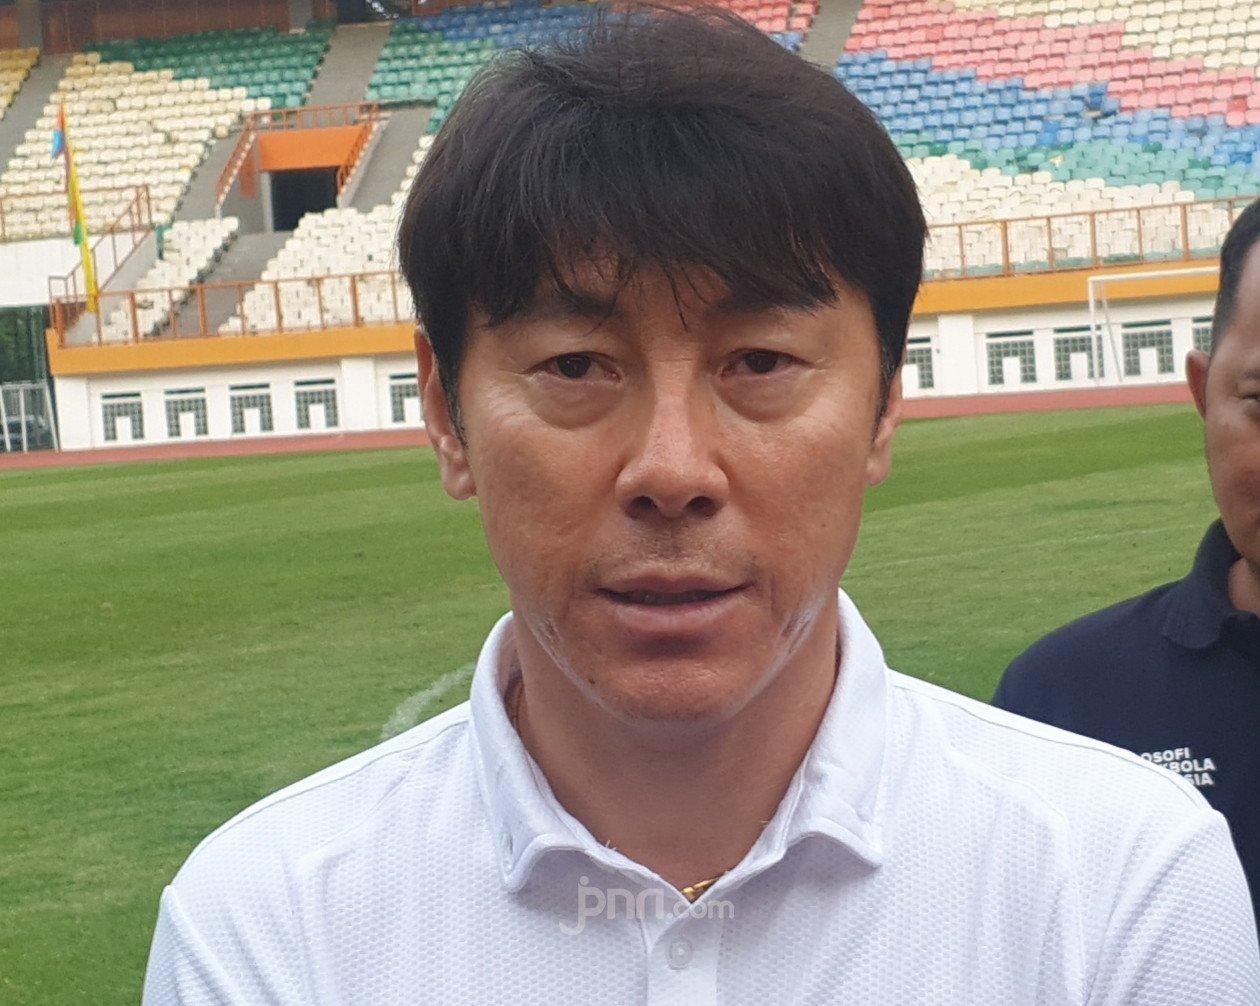 Shin Tae Yong Sembuh dari Covid-19, Nih Lokasi Pemulihannya - JPNN.com